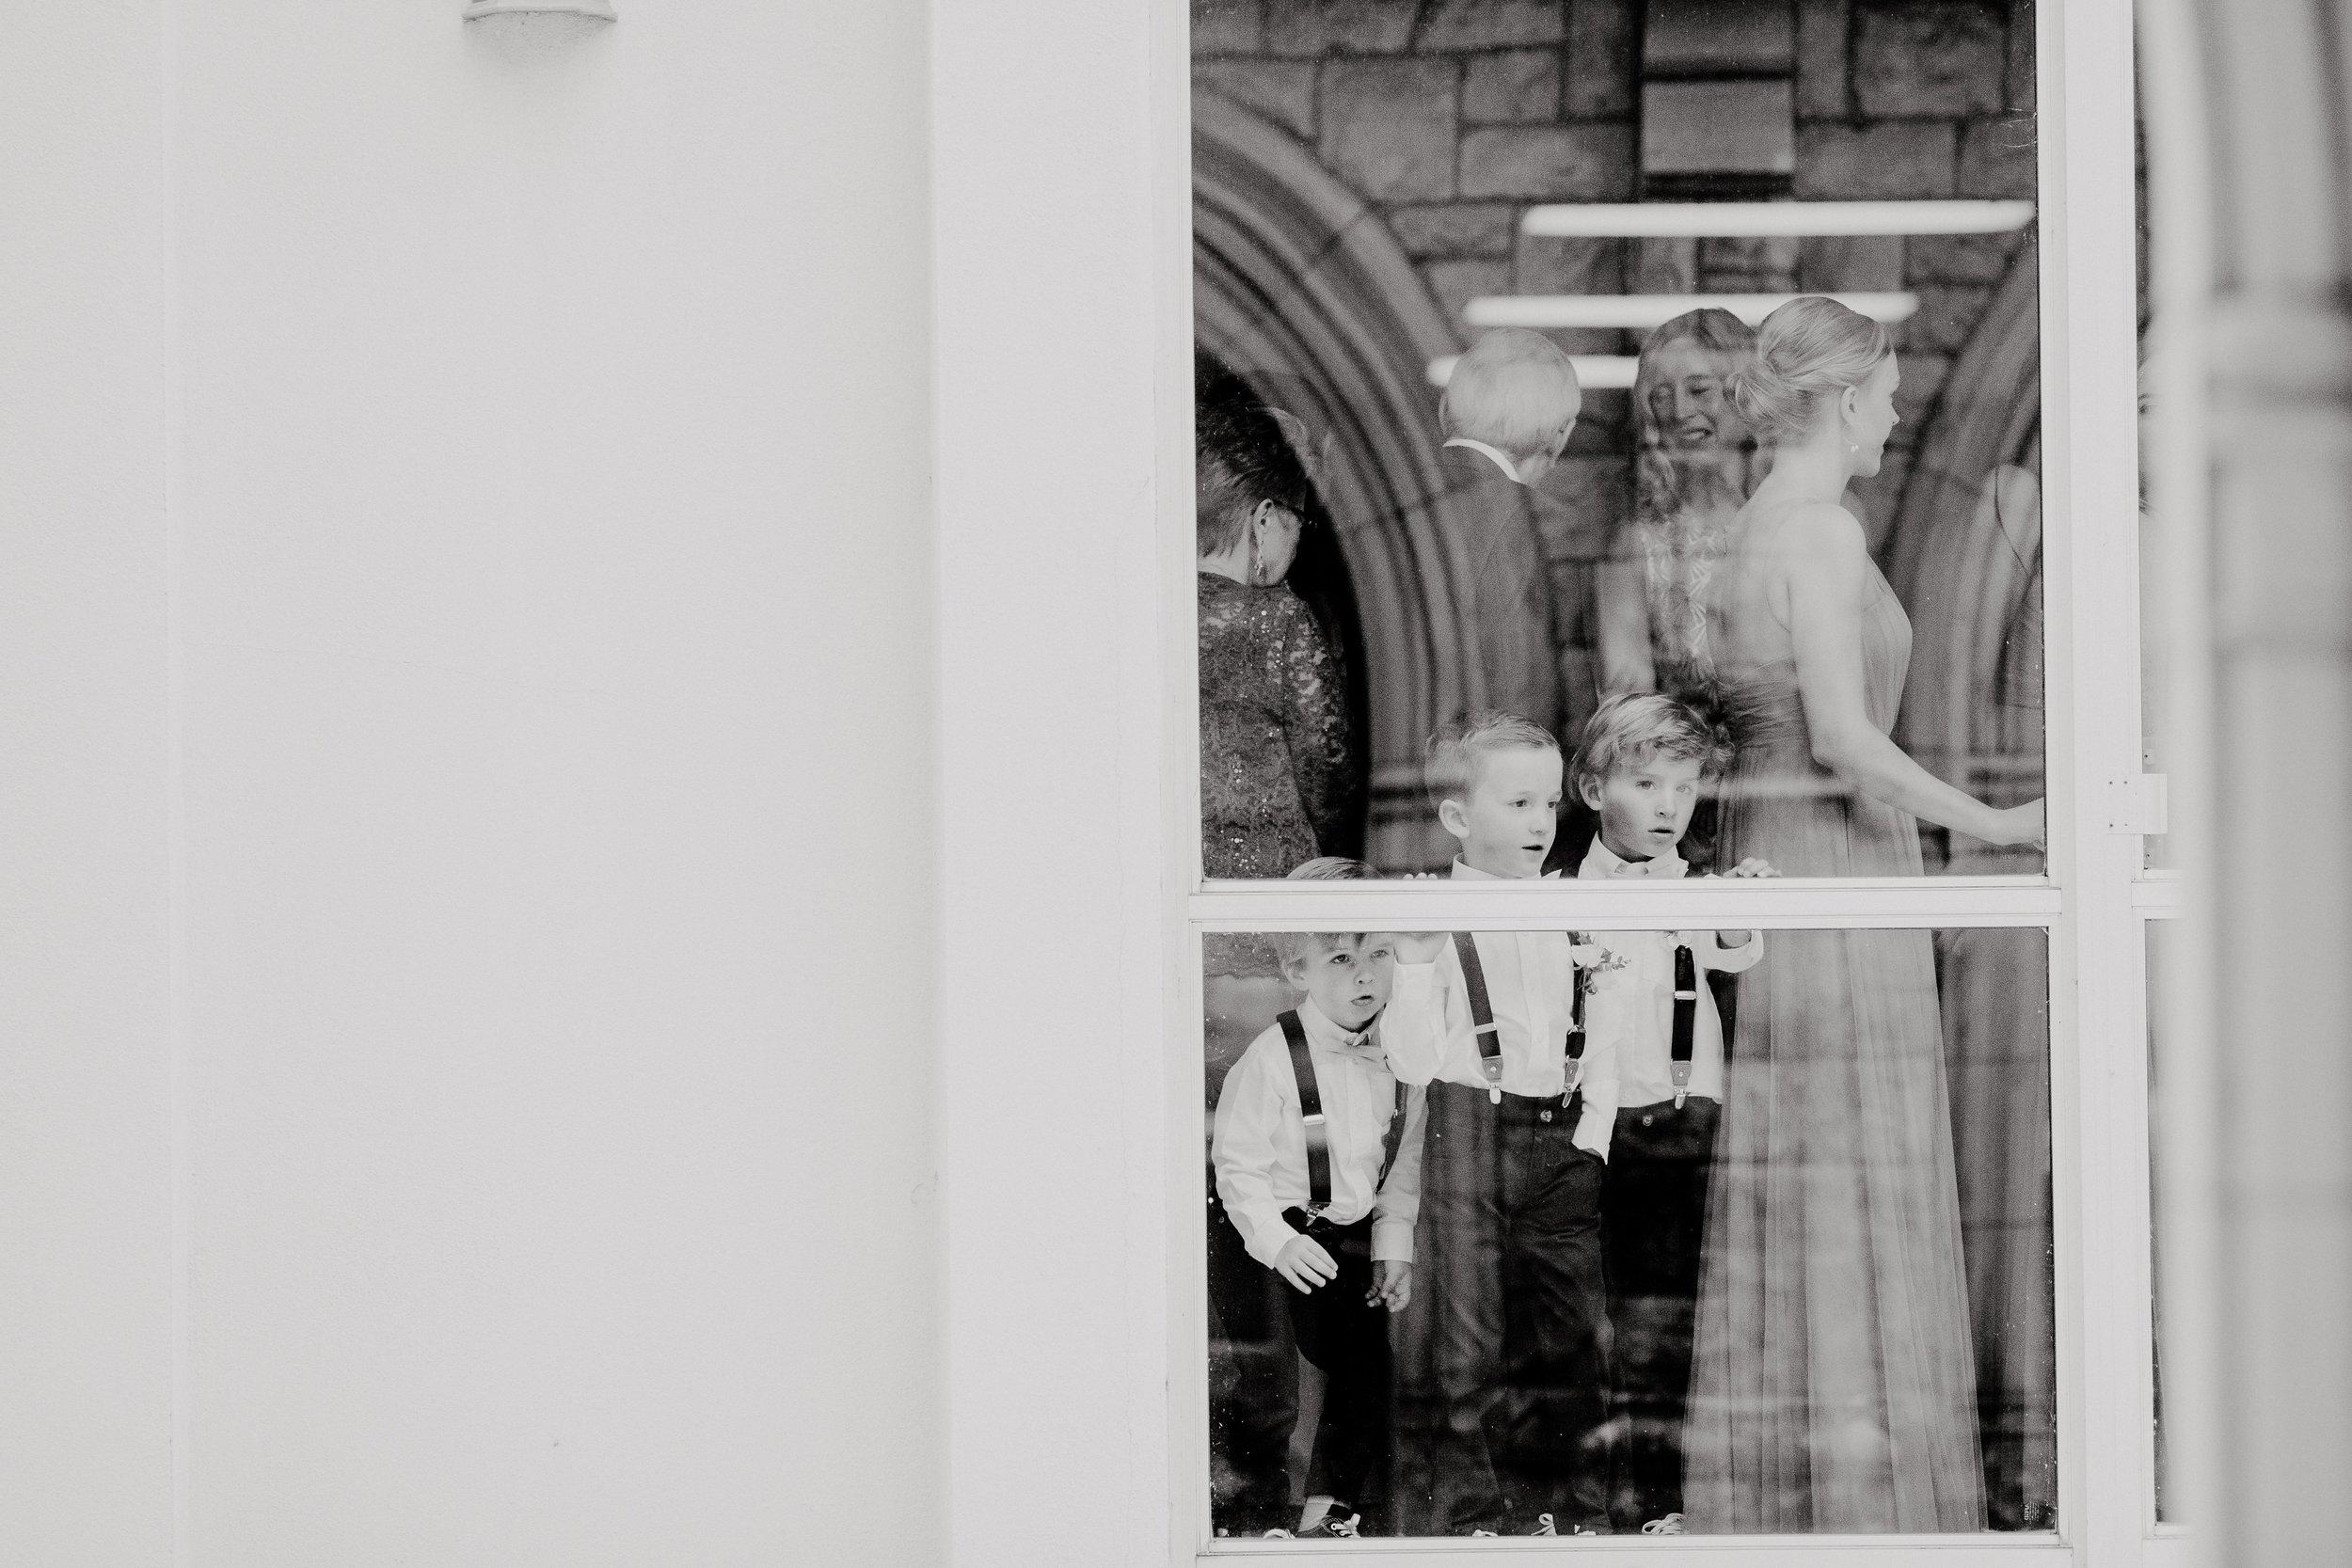 st-anthony-hotel-wedding-photography-10053san-antonio.JPG